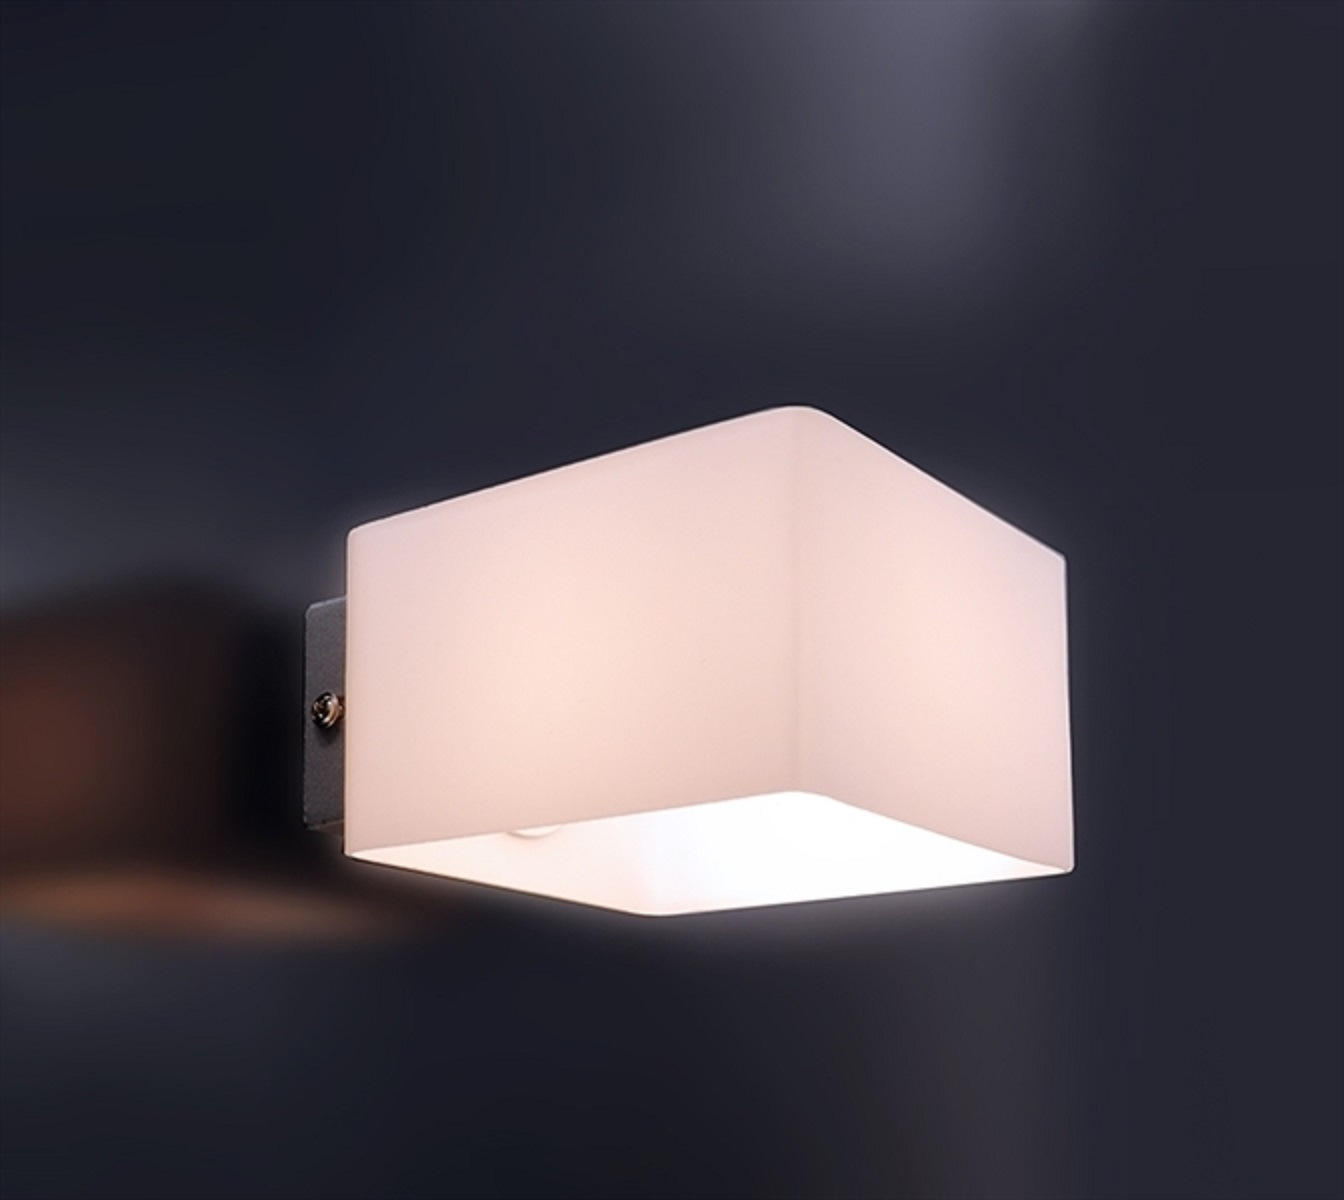 crossled: Lampada da parete Applique in vetro bianco G9 230V ...